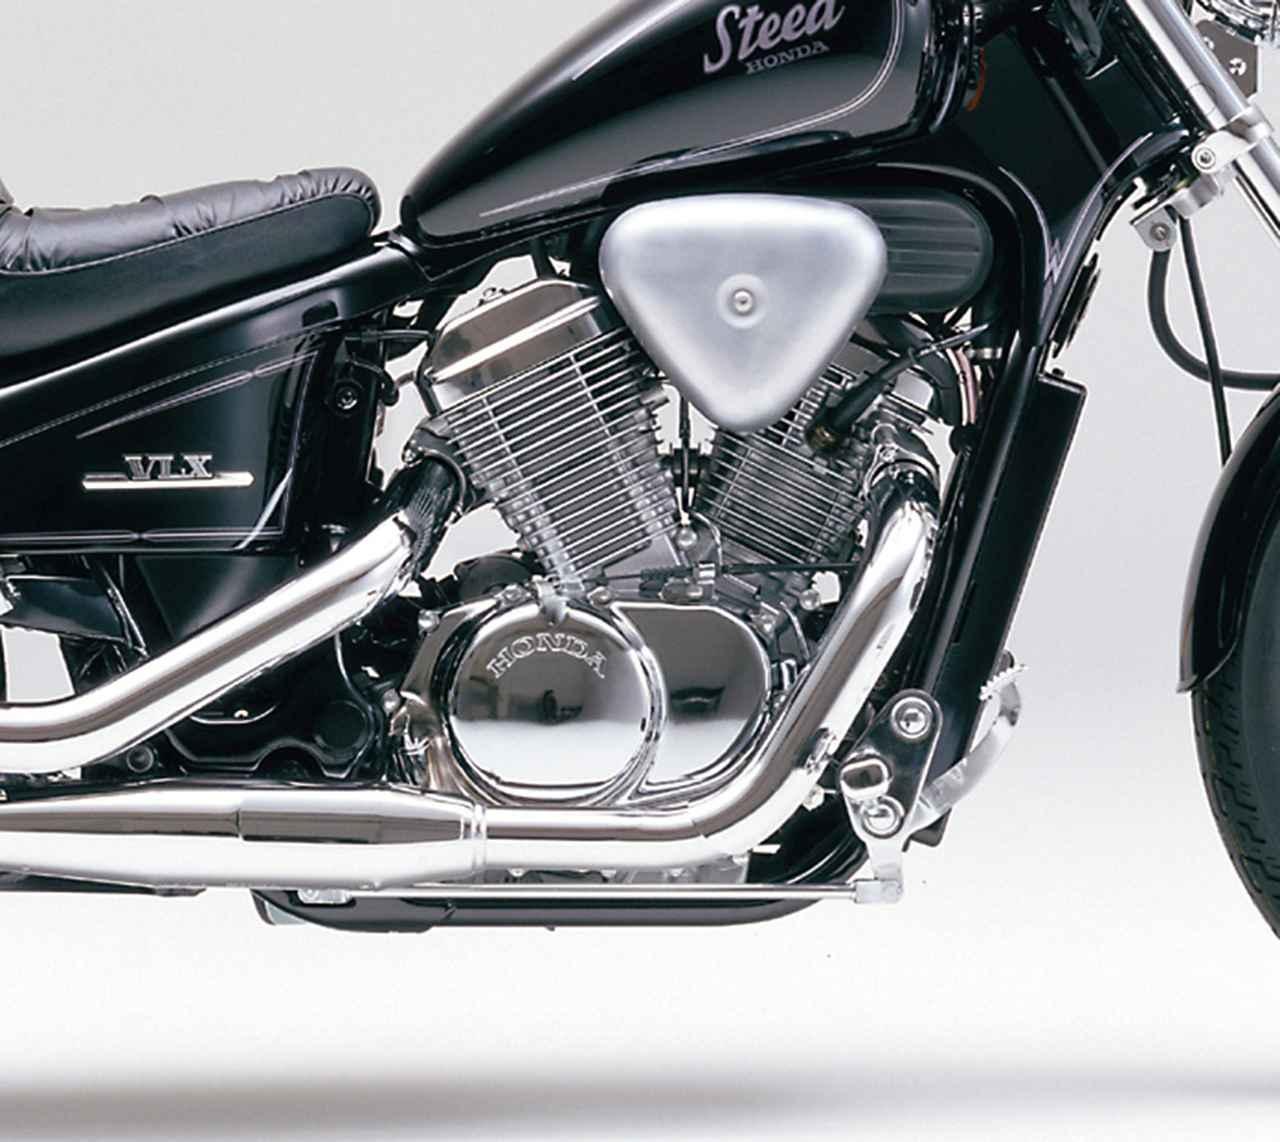 Images : 1番目の画像 - STEED 400 VLX - webオートバイ